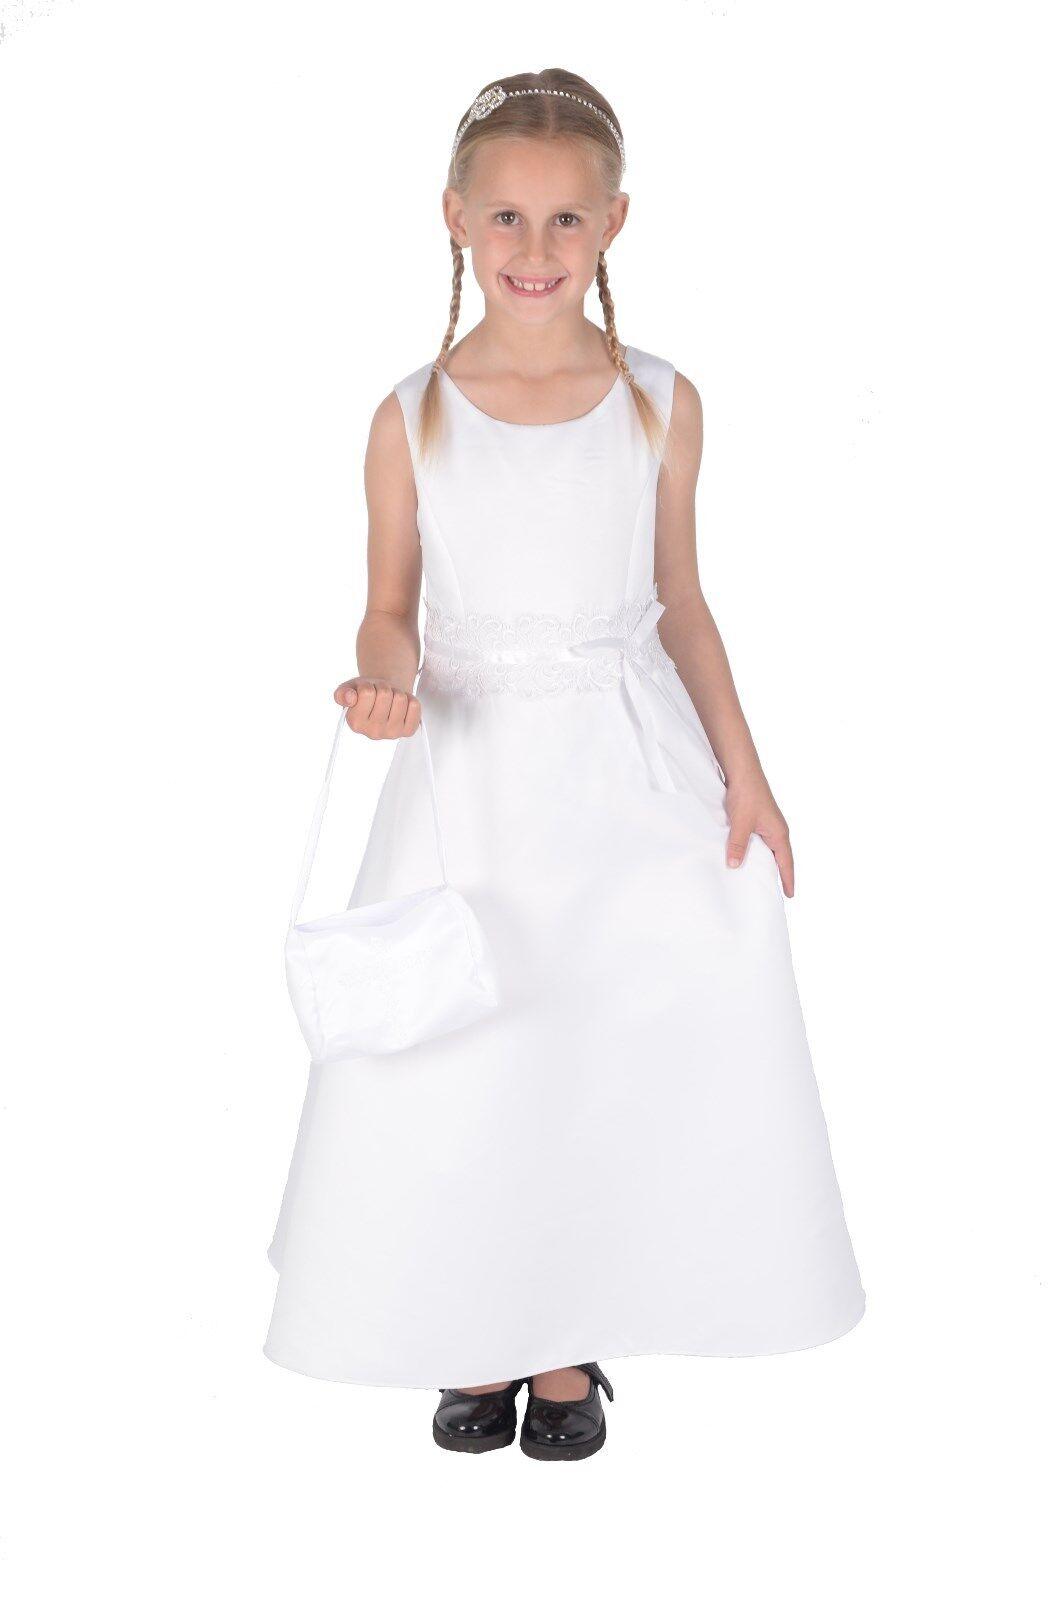 Girls Satin Holy Communion Dress with Handbag White Ivory 7-8 to 14-15 Years